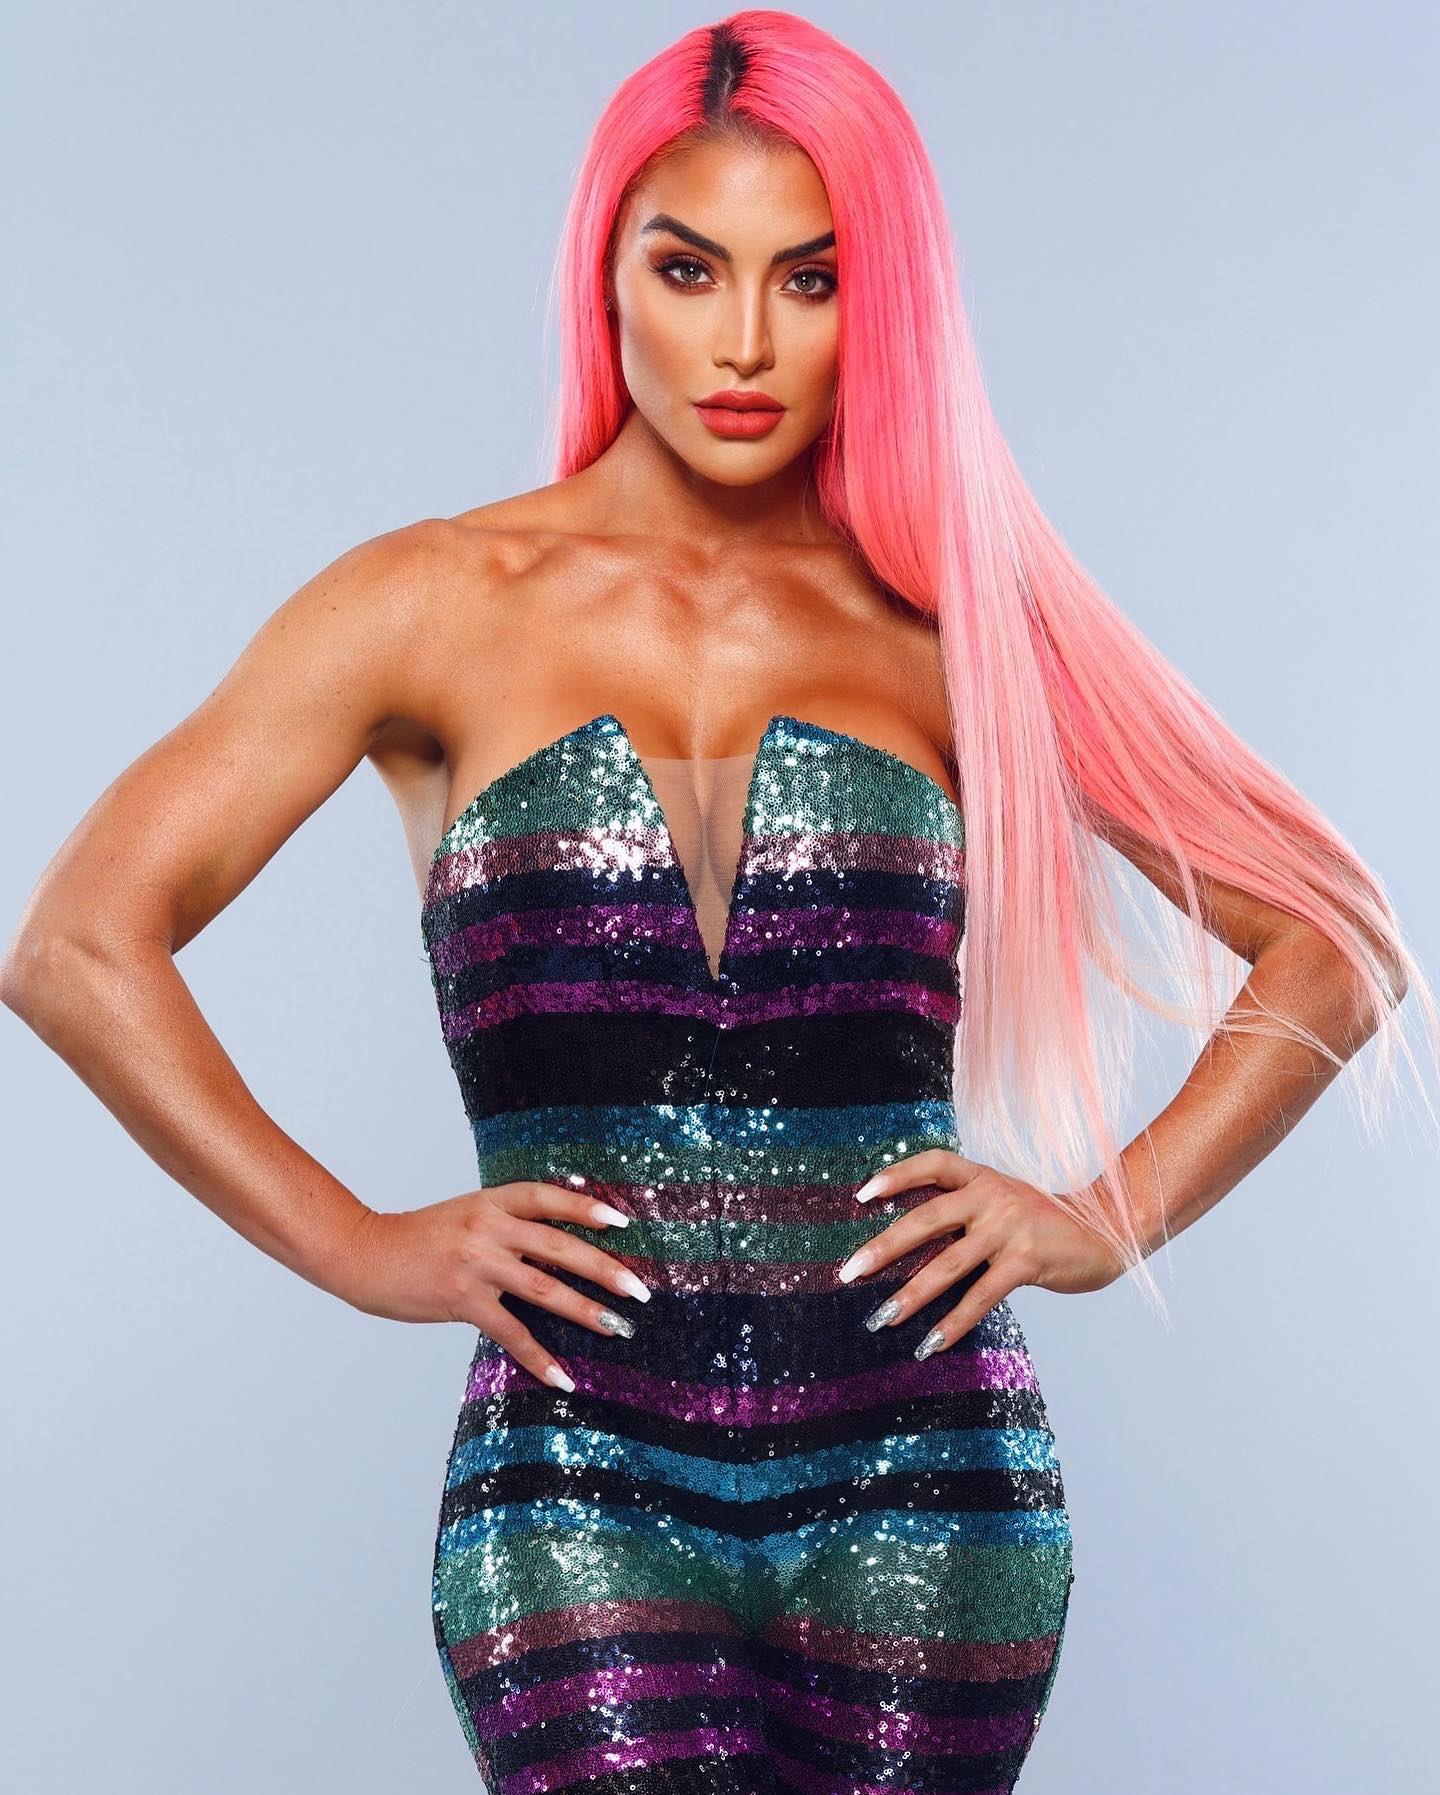 WWE Star Eva Marie Shares New Glittering Pink Power Photos 129